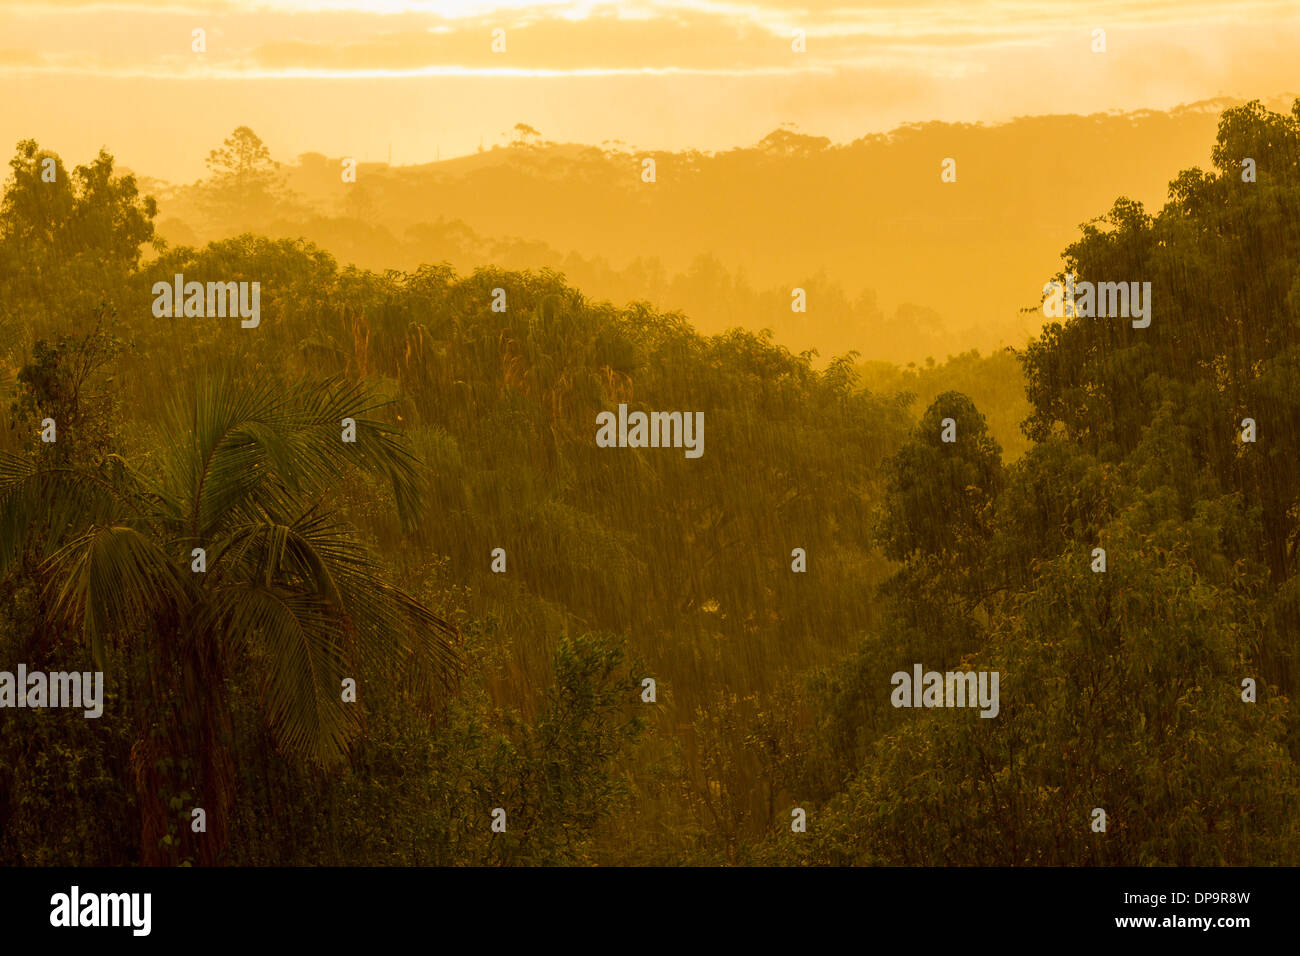 Monsun-Regen in einem Regenwald bei Sonnenuntergang Stockbild